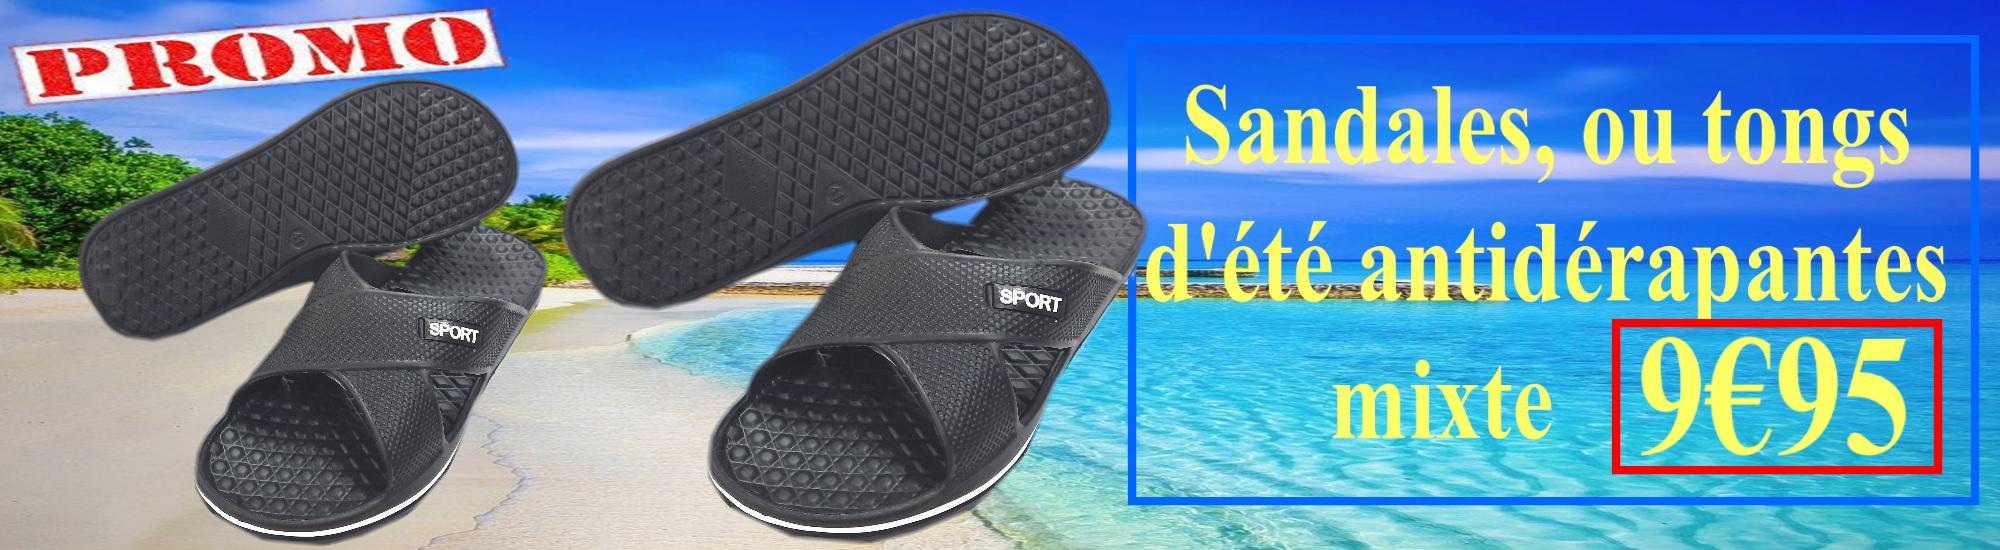 Sandales, ou tongs